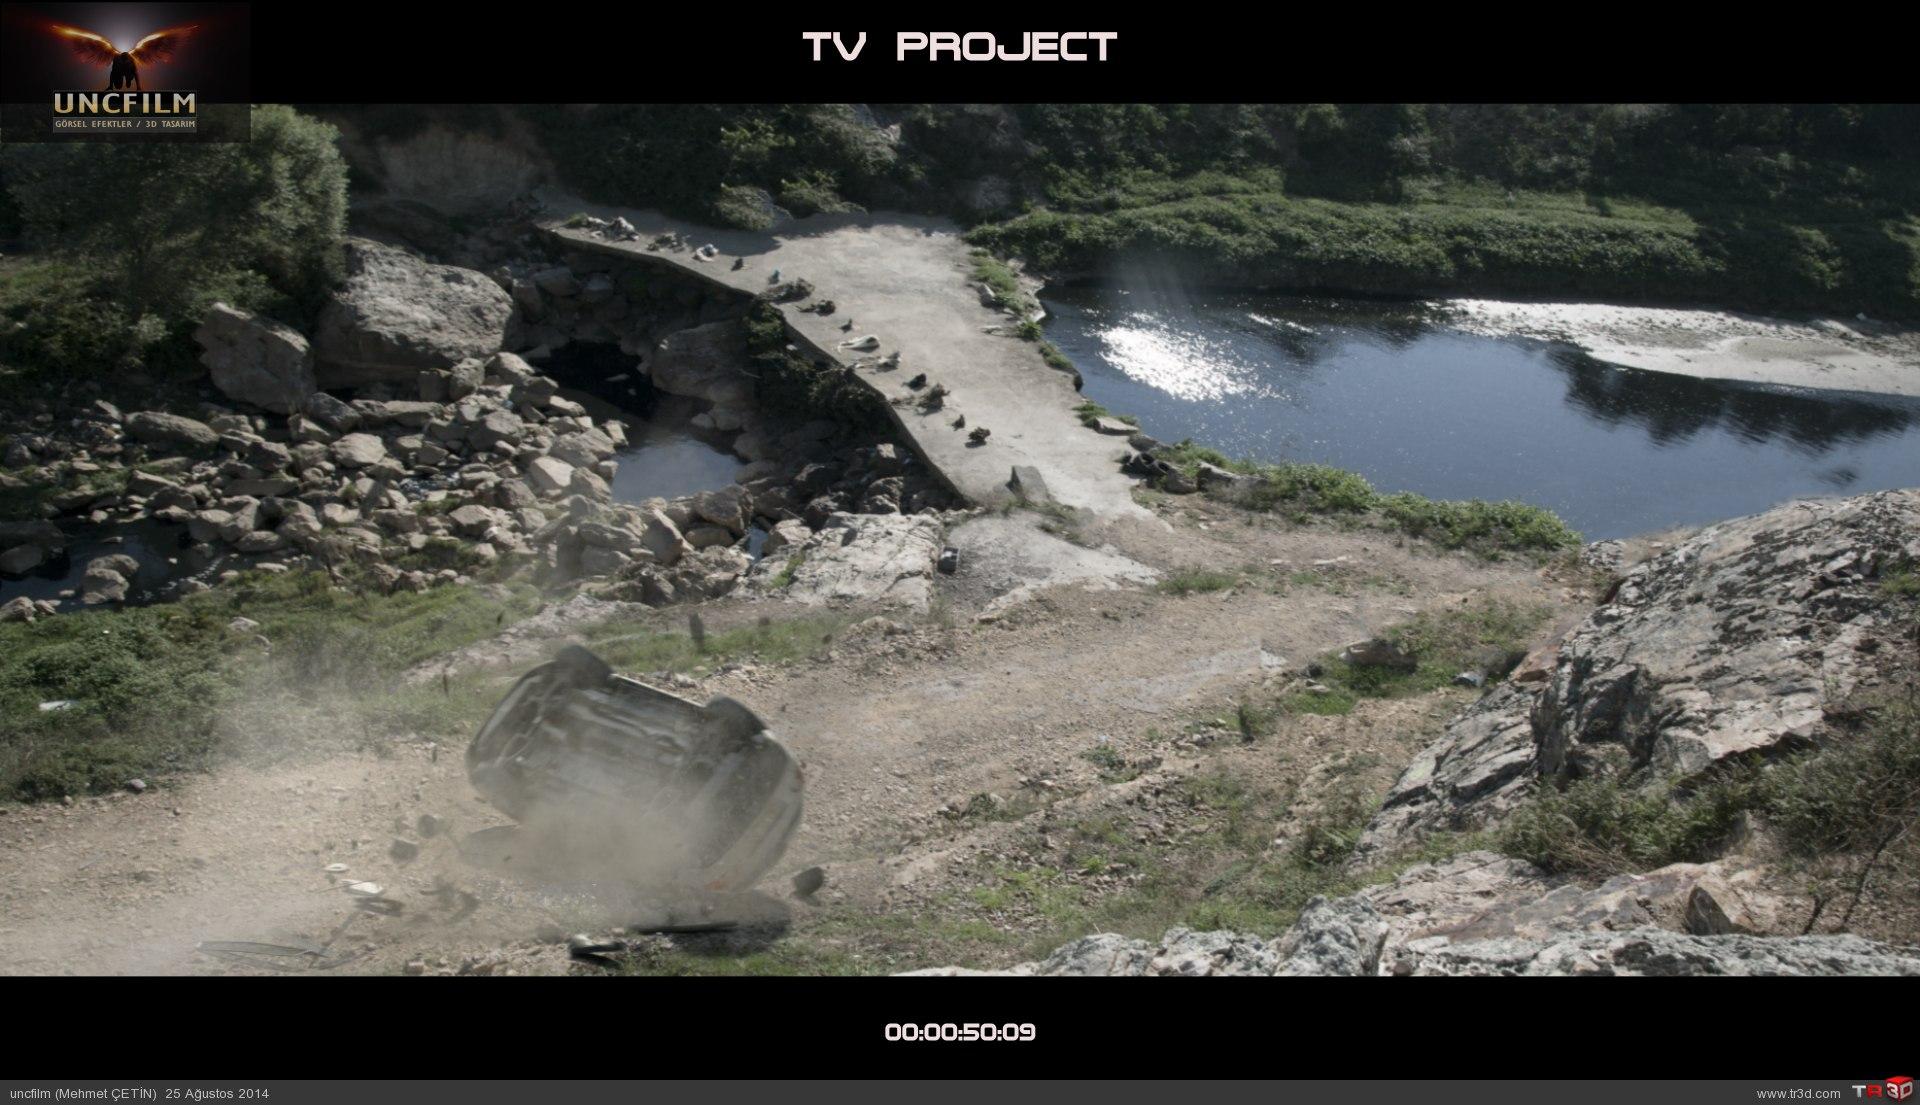 Tv produksiyon, kaza sahnesi 3